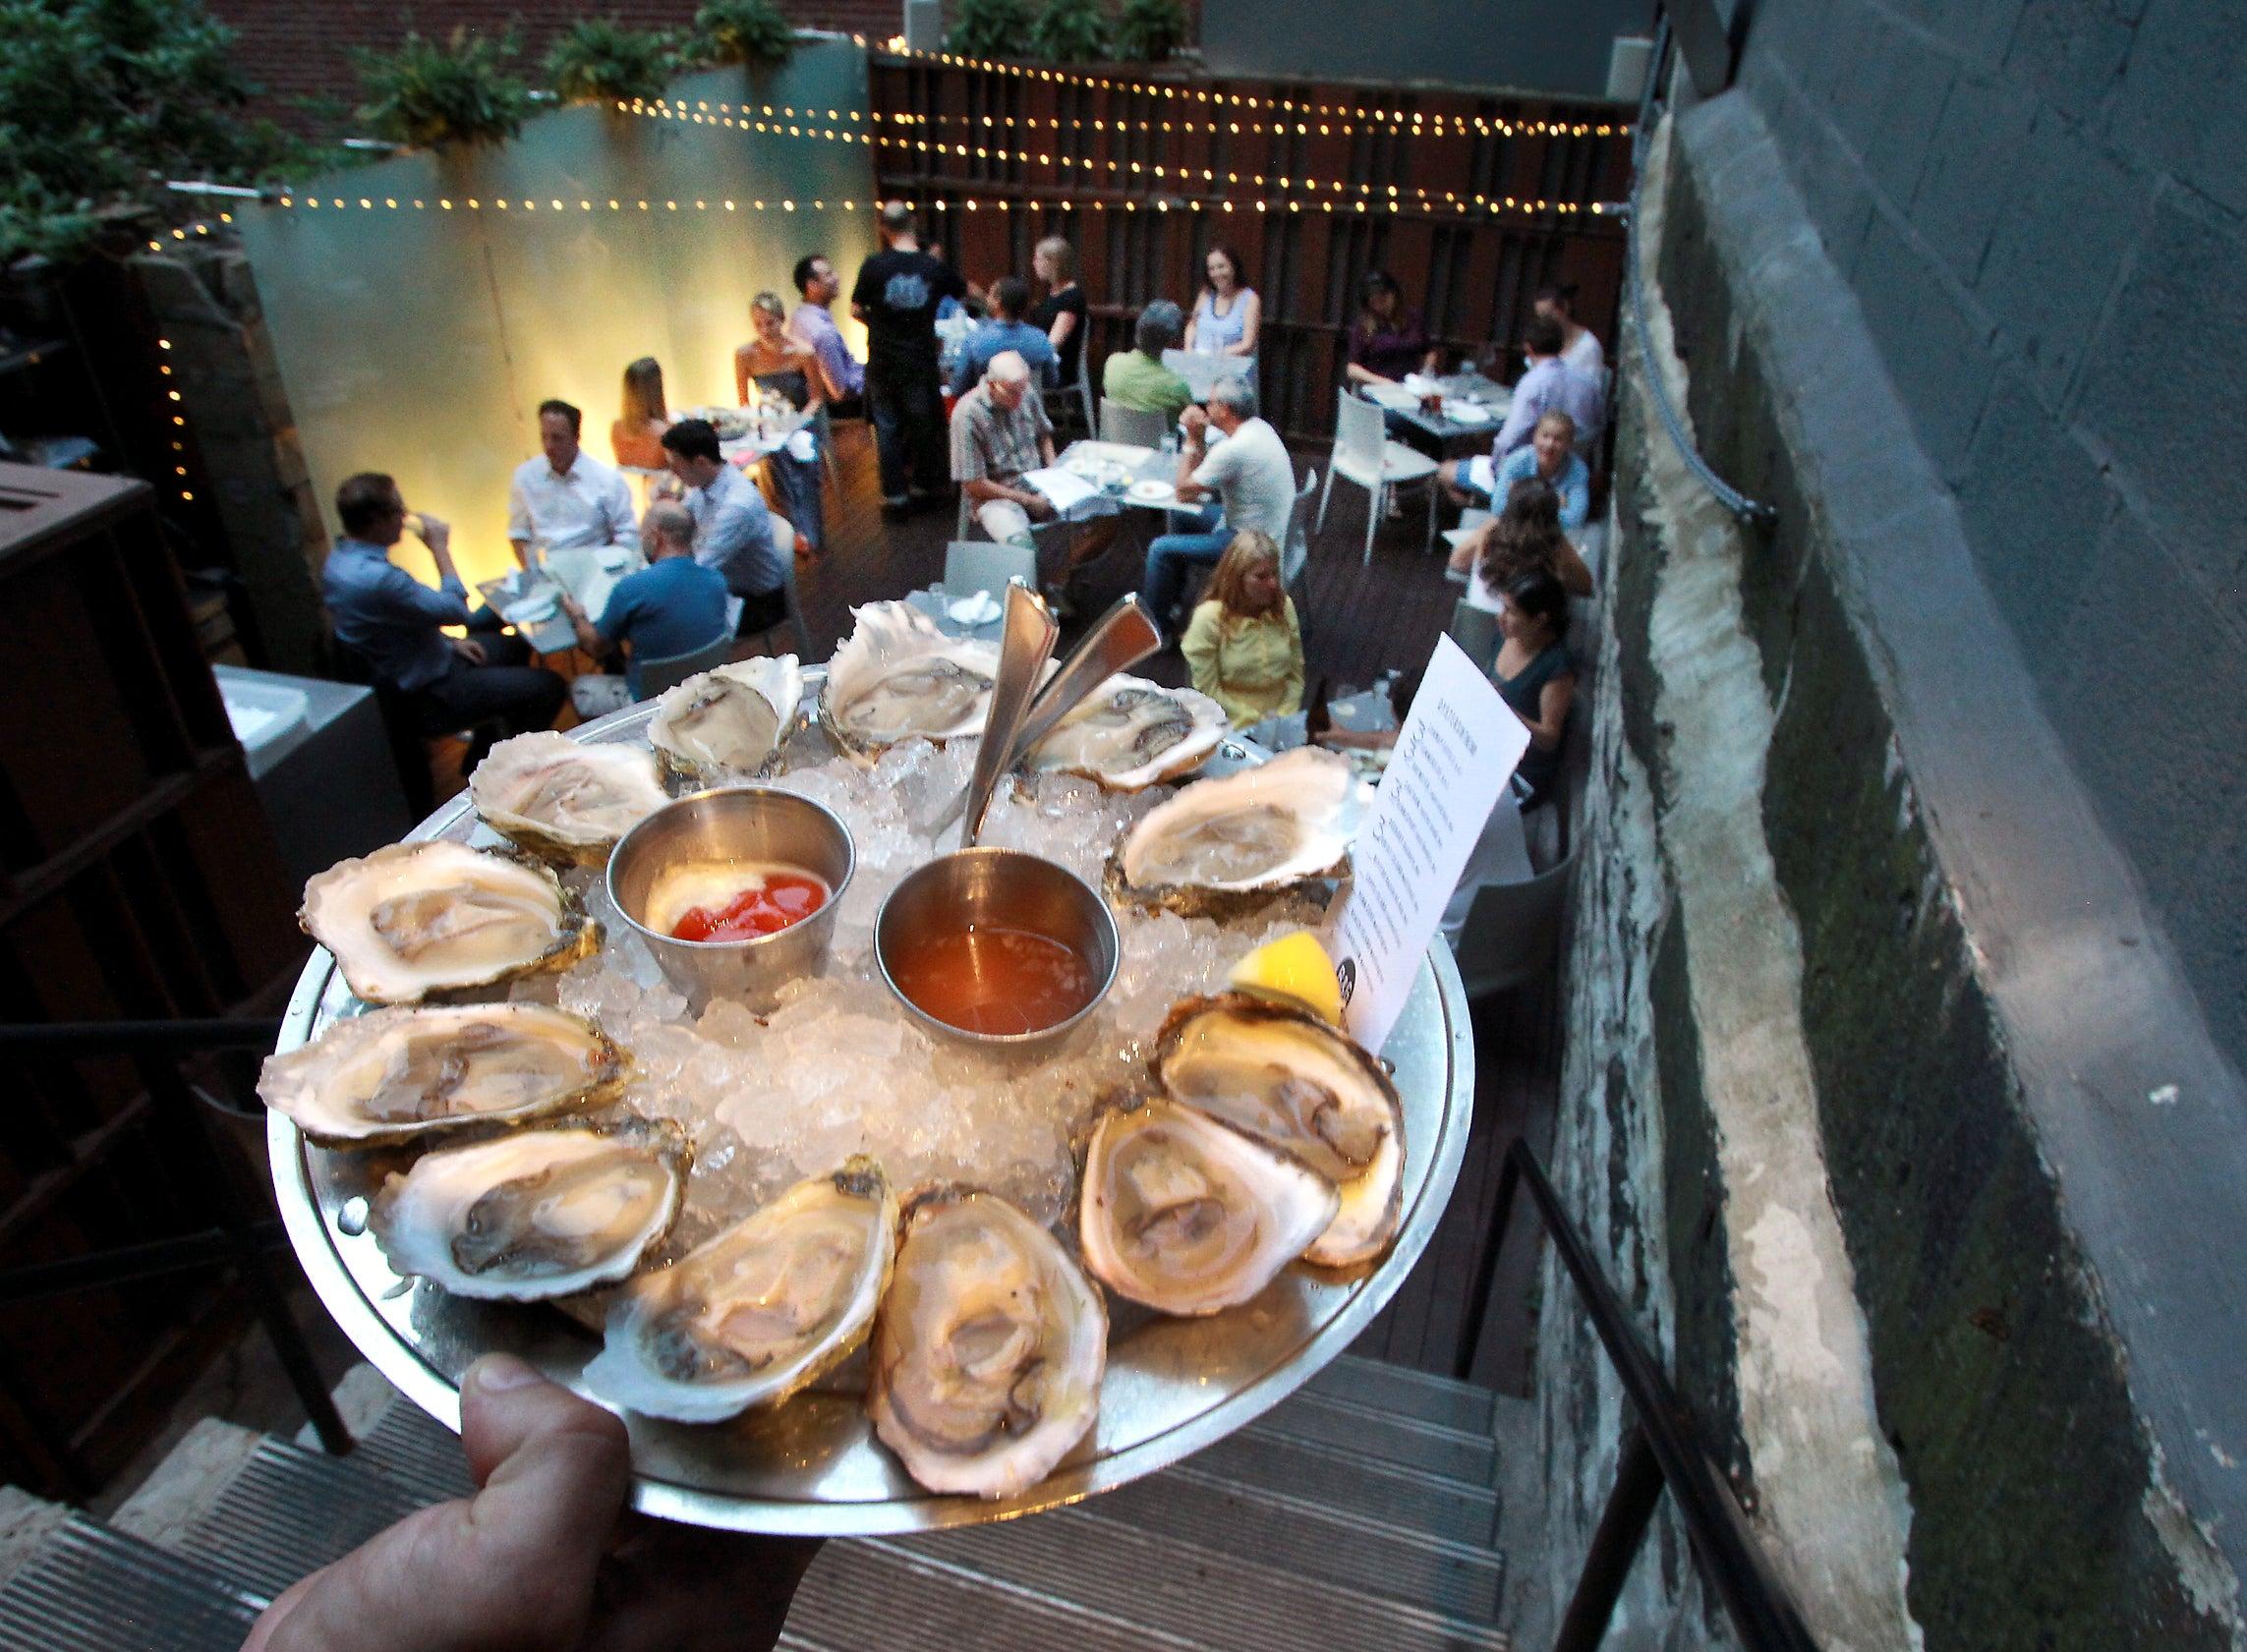 B&G Oysters in Boston